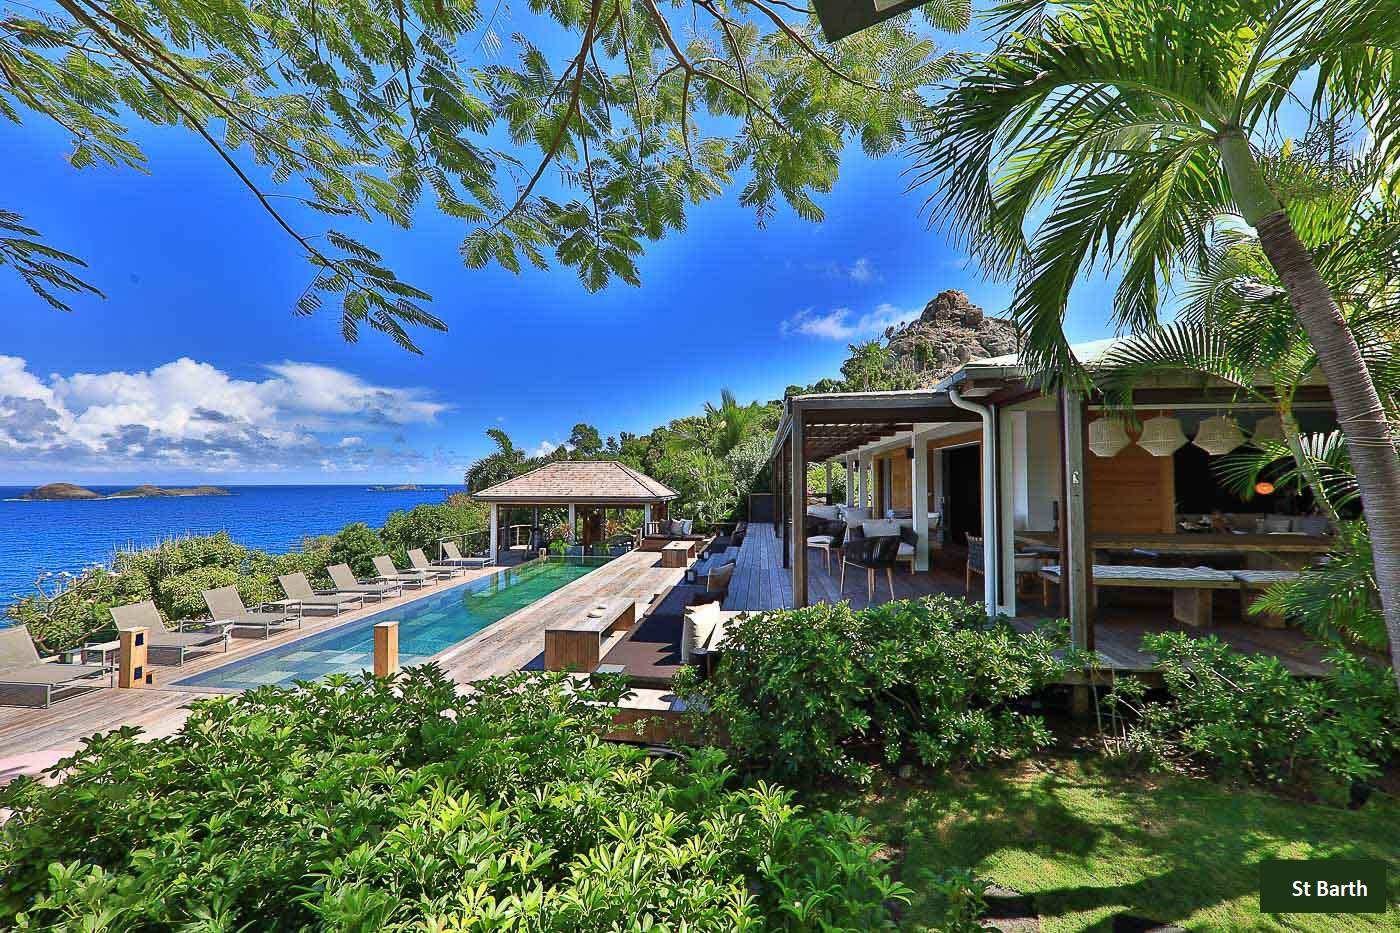 Best Kitchen Gallery: Location Maison Saint Barth Avie Home of St Bart Villa  on rachelxblog.com